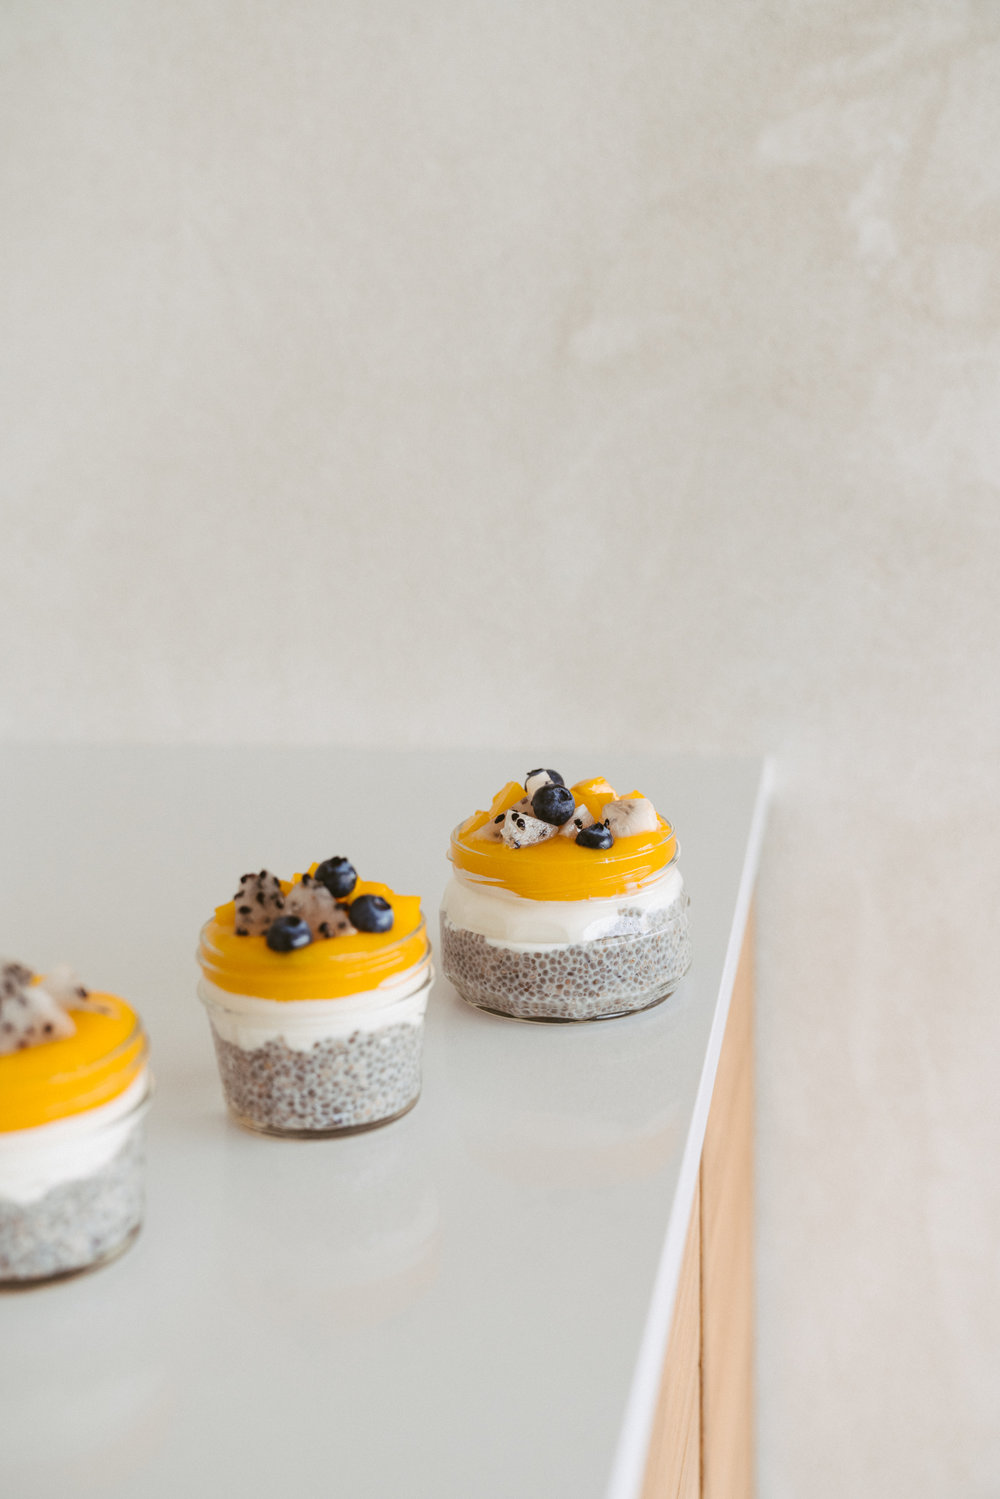 mango_passionfruit_chia_and_yoghurt_jars-3.jpg